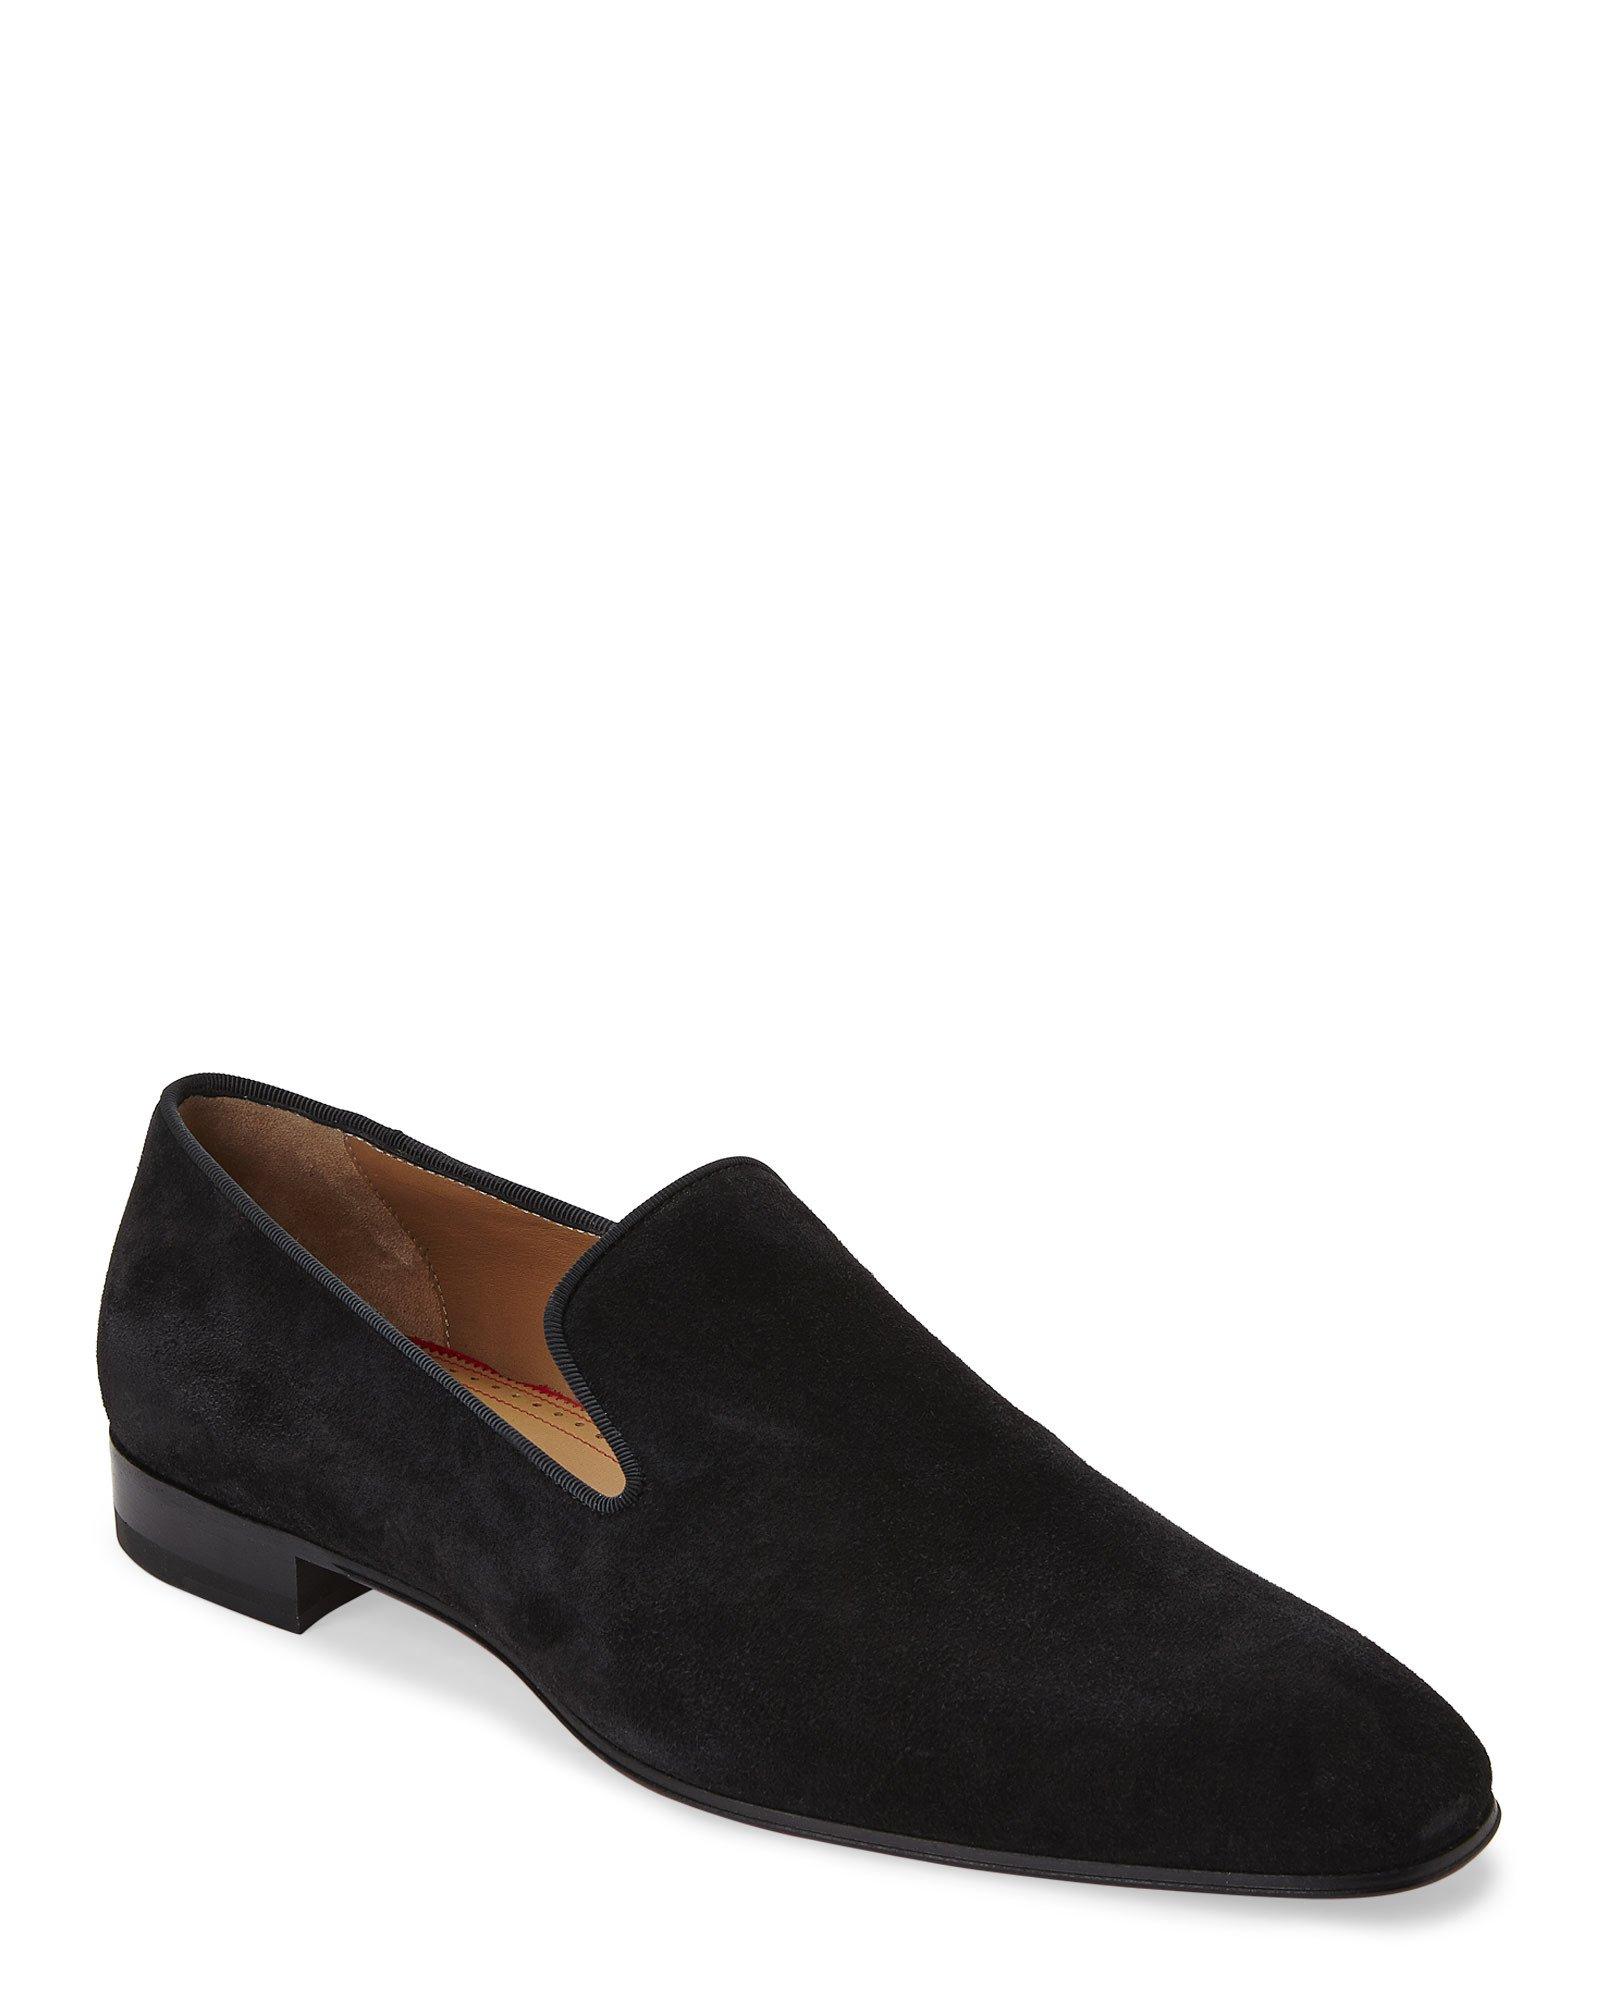 dd2780dab5e Lyst - Christian Louboutin Black Dandelion Smoking Loafers in Black ...